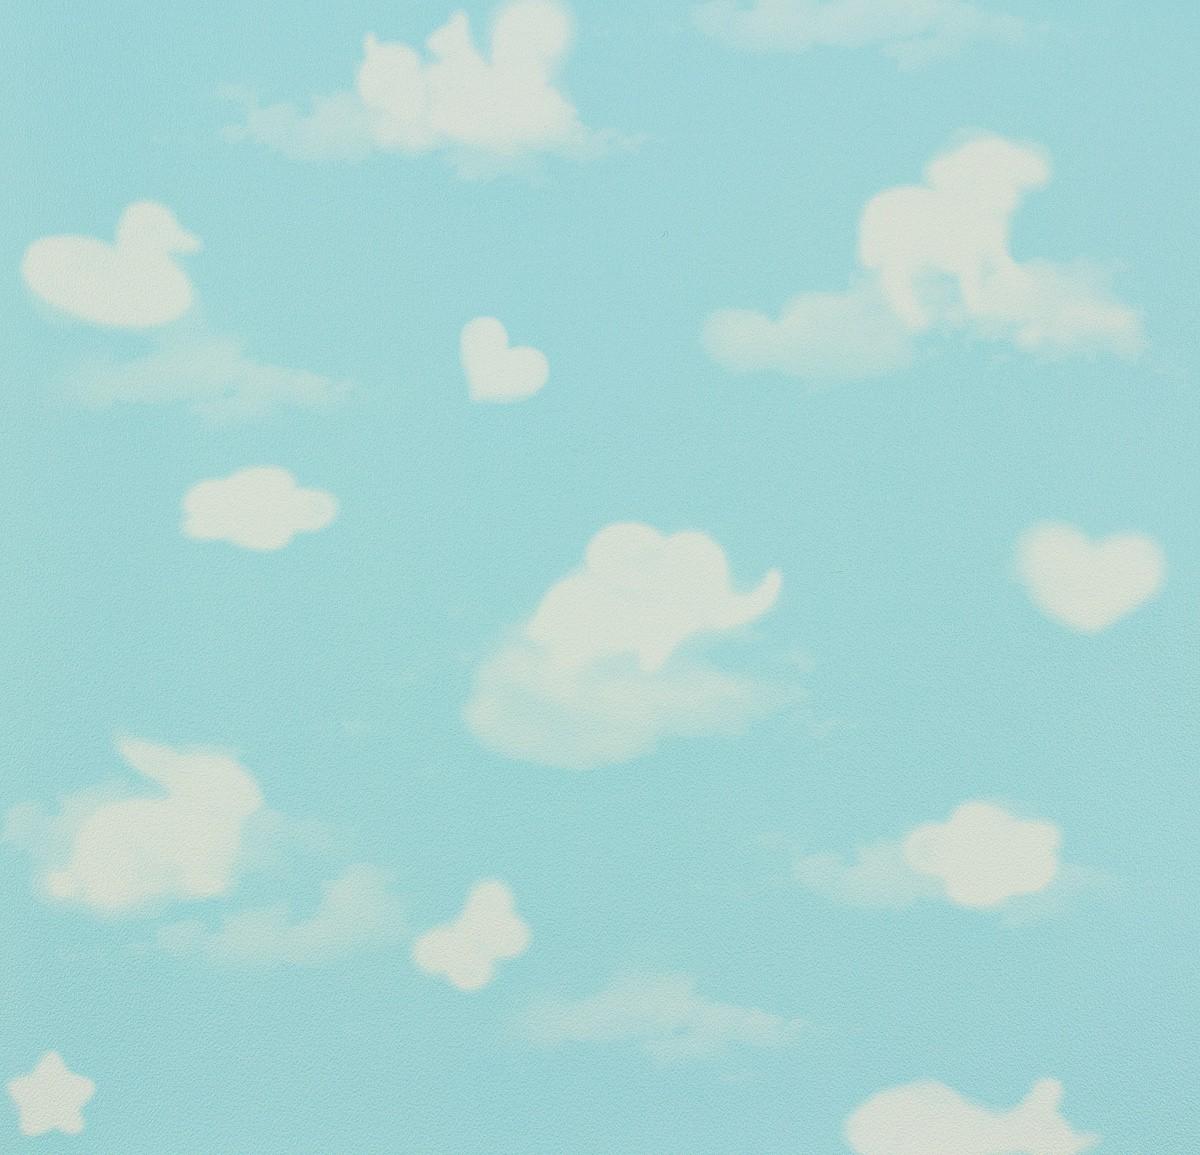 kindertapete blau wei wolken happy kids ps 05572 10. Black Bedroom Furniture Sets. Home Design Ideas